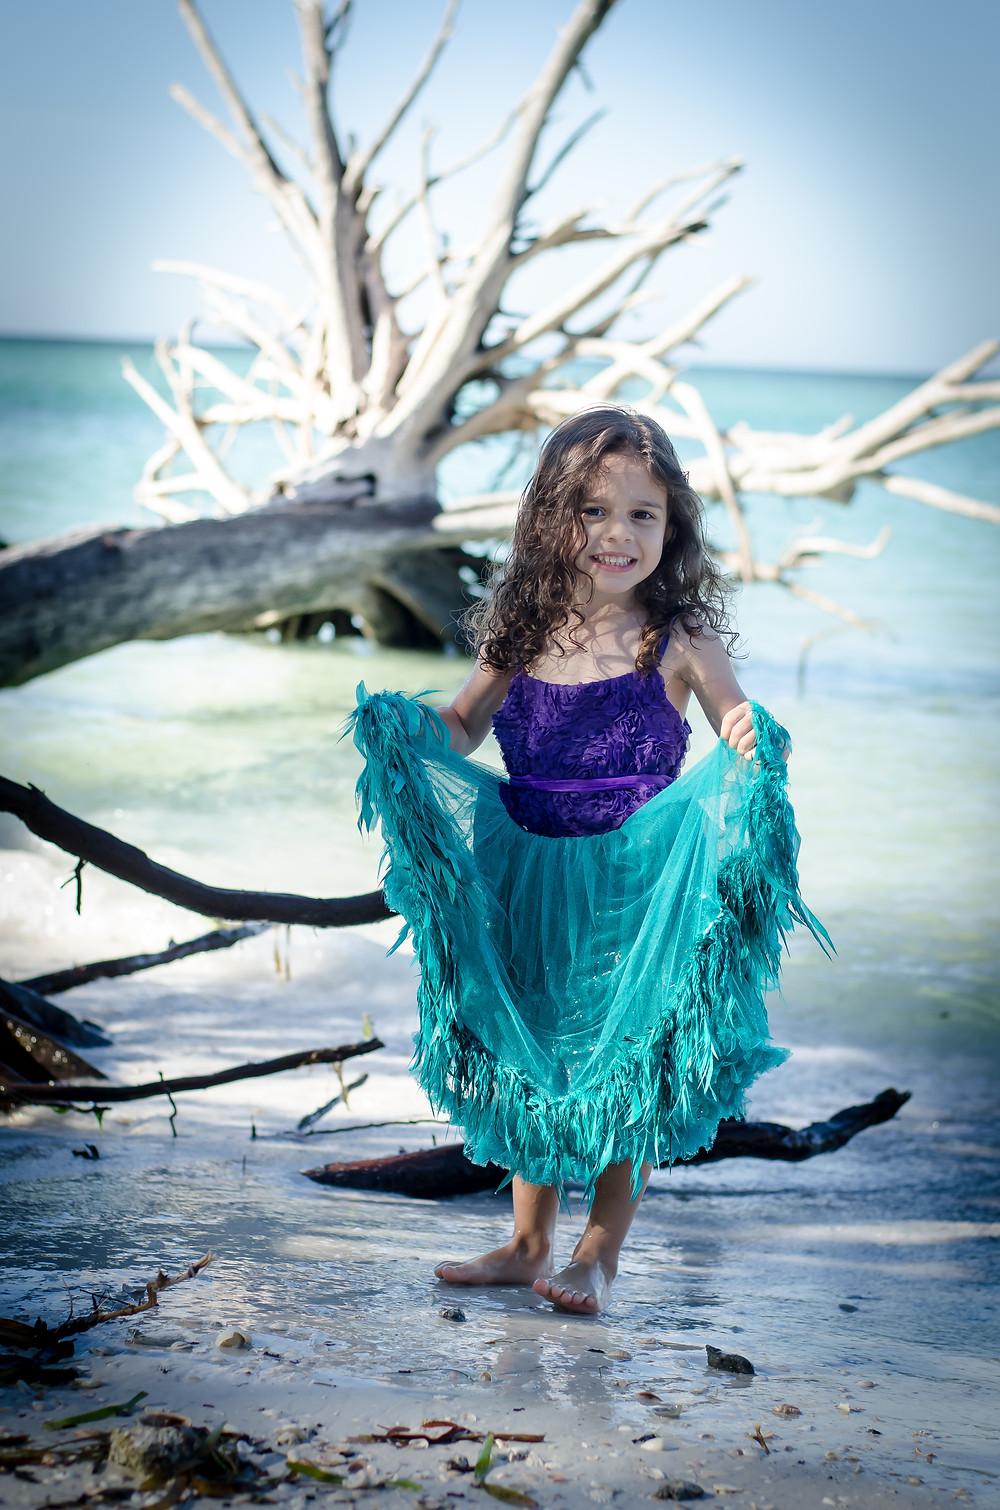 Mermaid Gianna in Sarasota